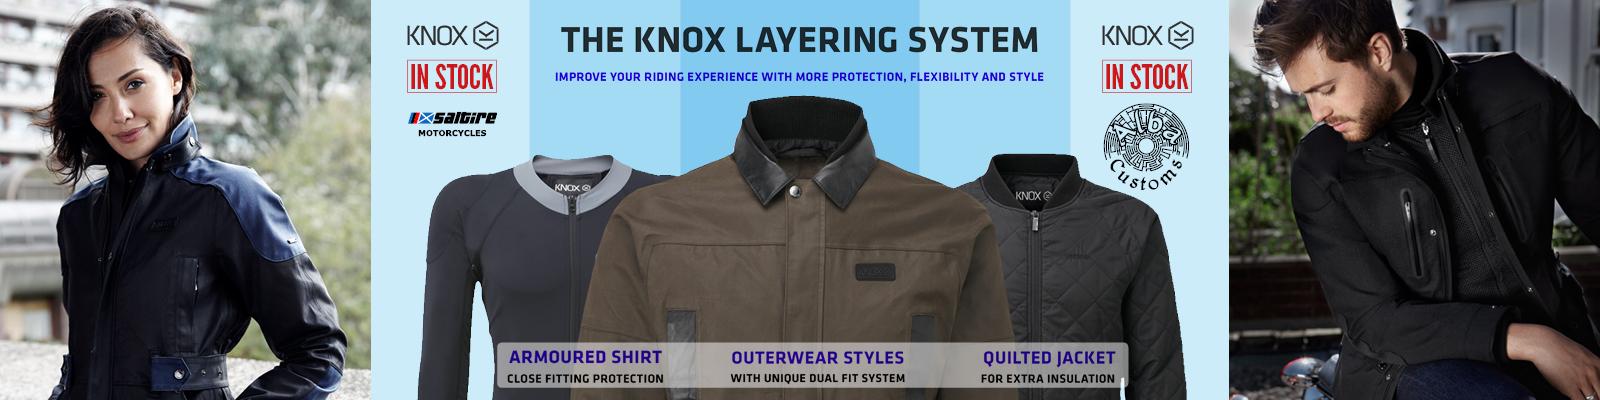 Knox Layering System